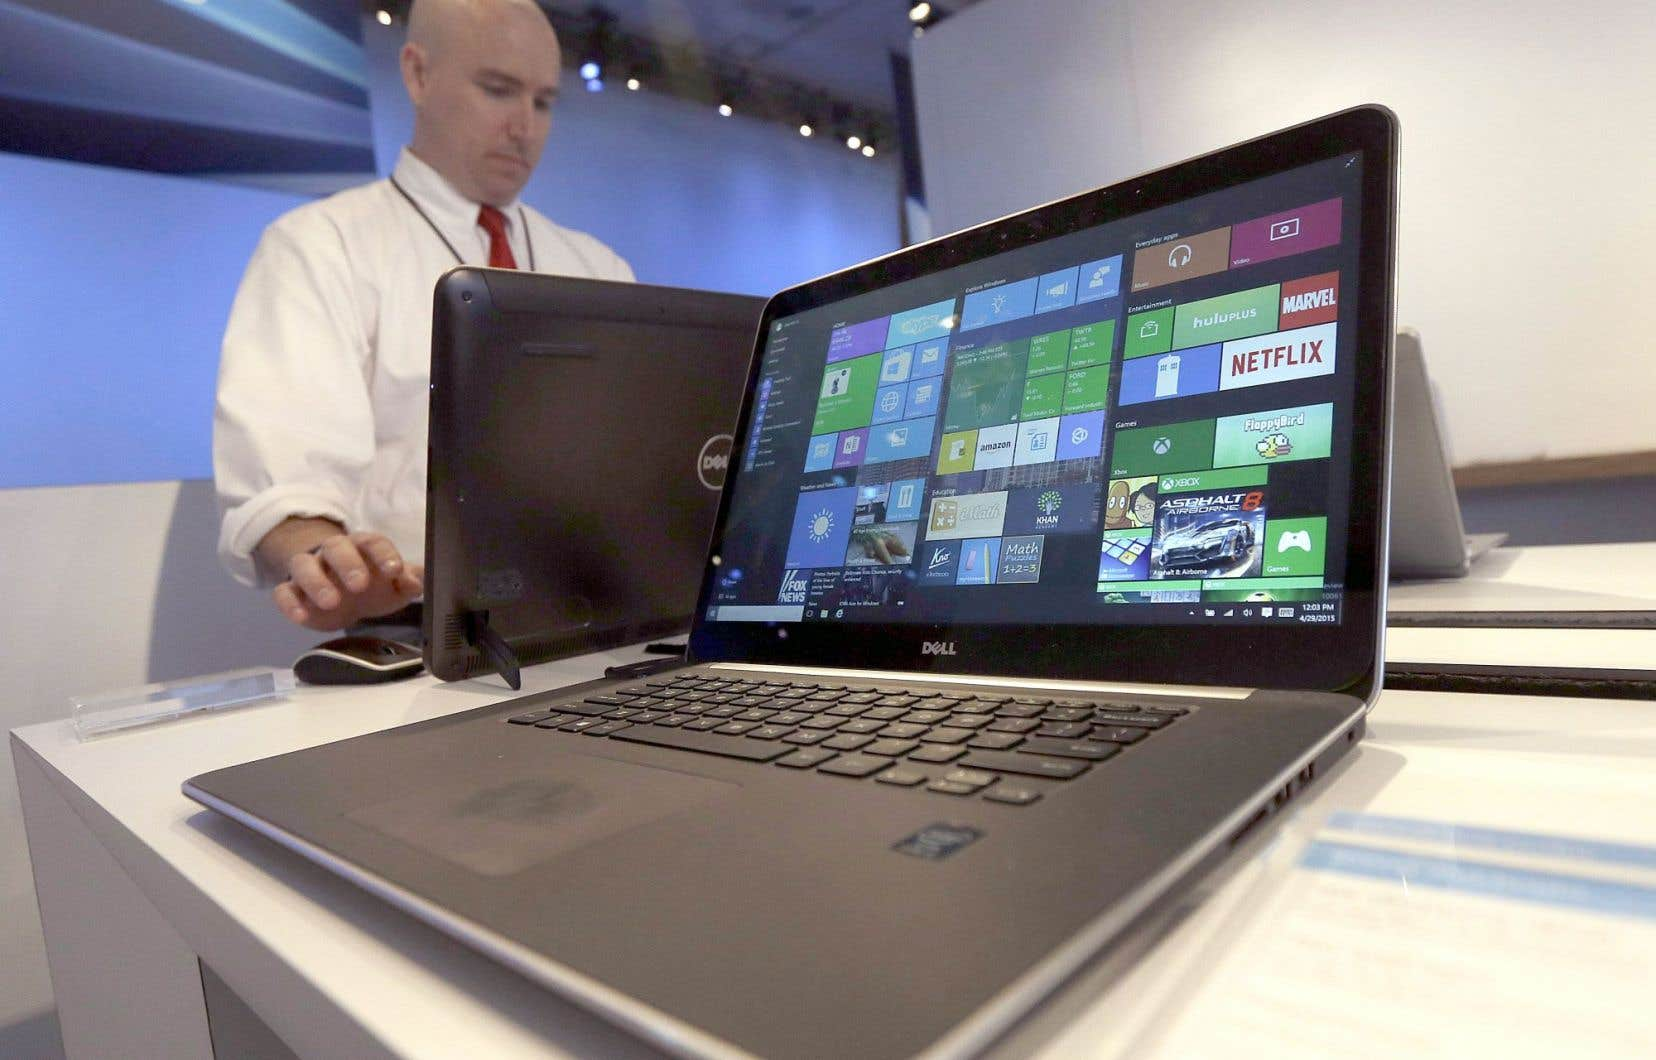 Le système d'exploitation Windows 10